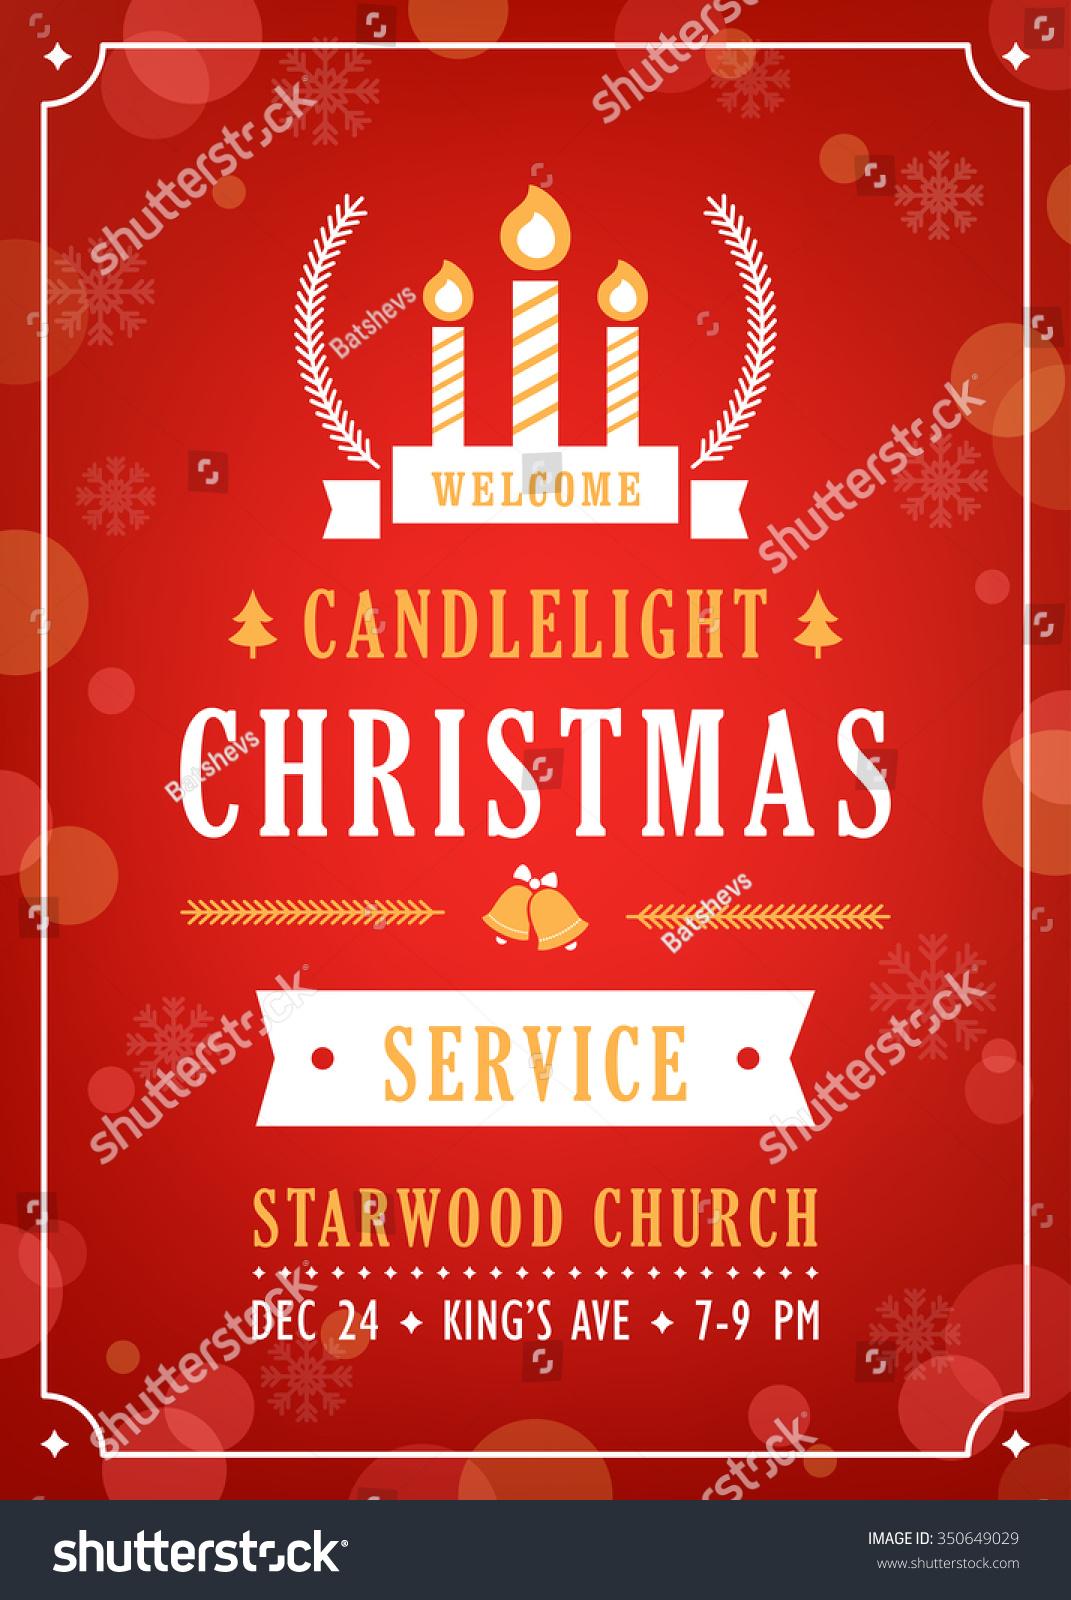 Christmas Candlelight Service Church Invitation Stock Vector ...